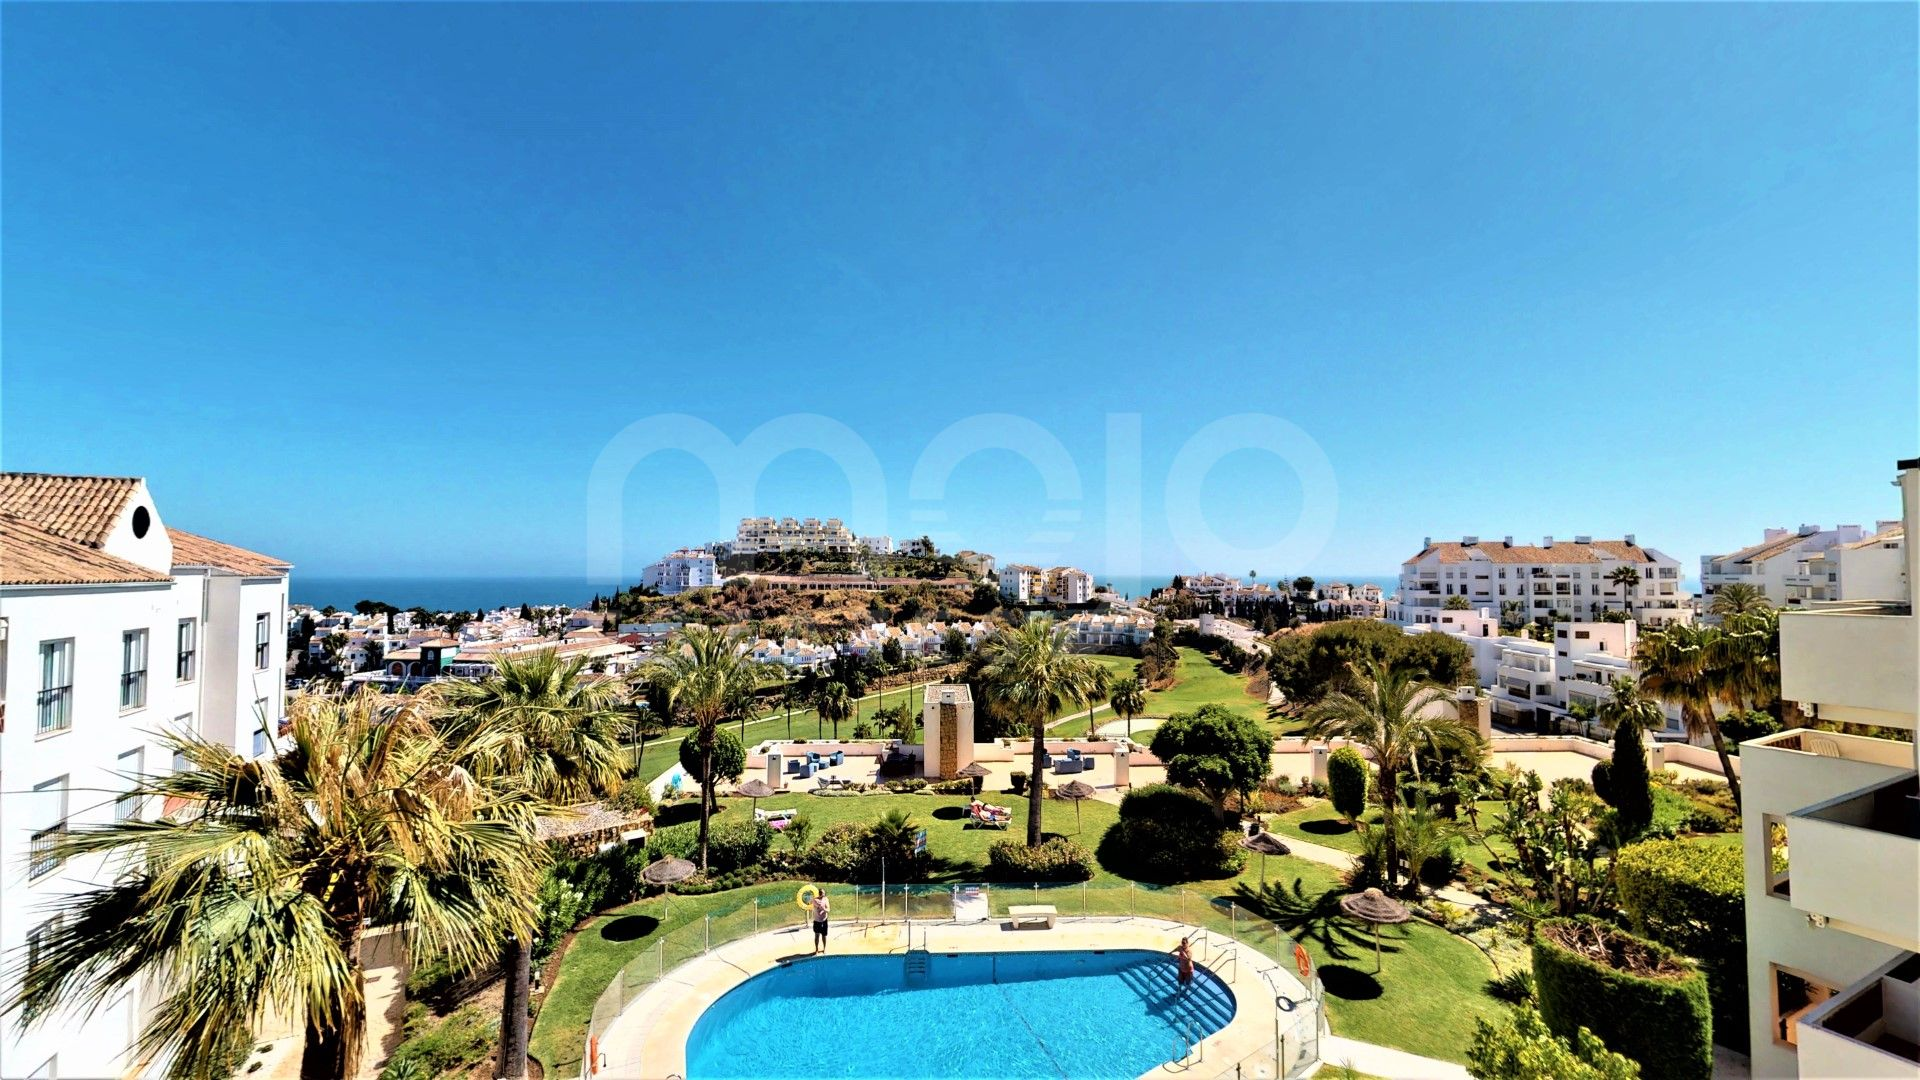 Duplex Penthouse for sale in Miraflores, Marbella